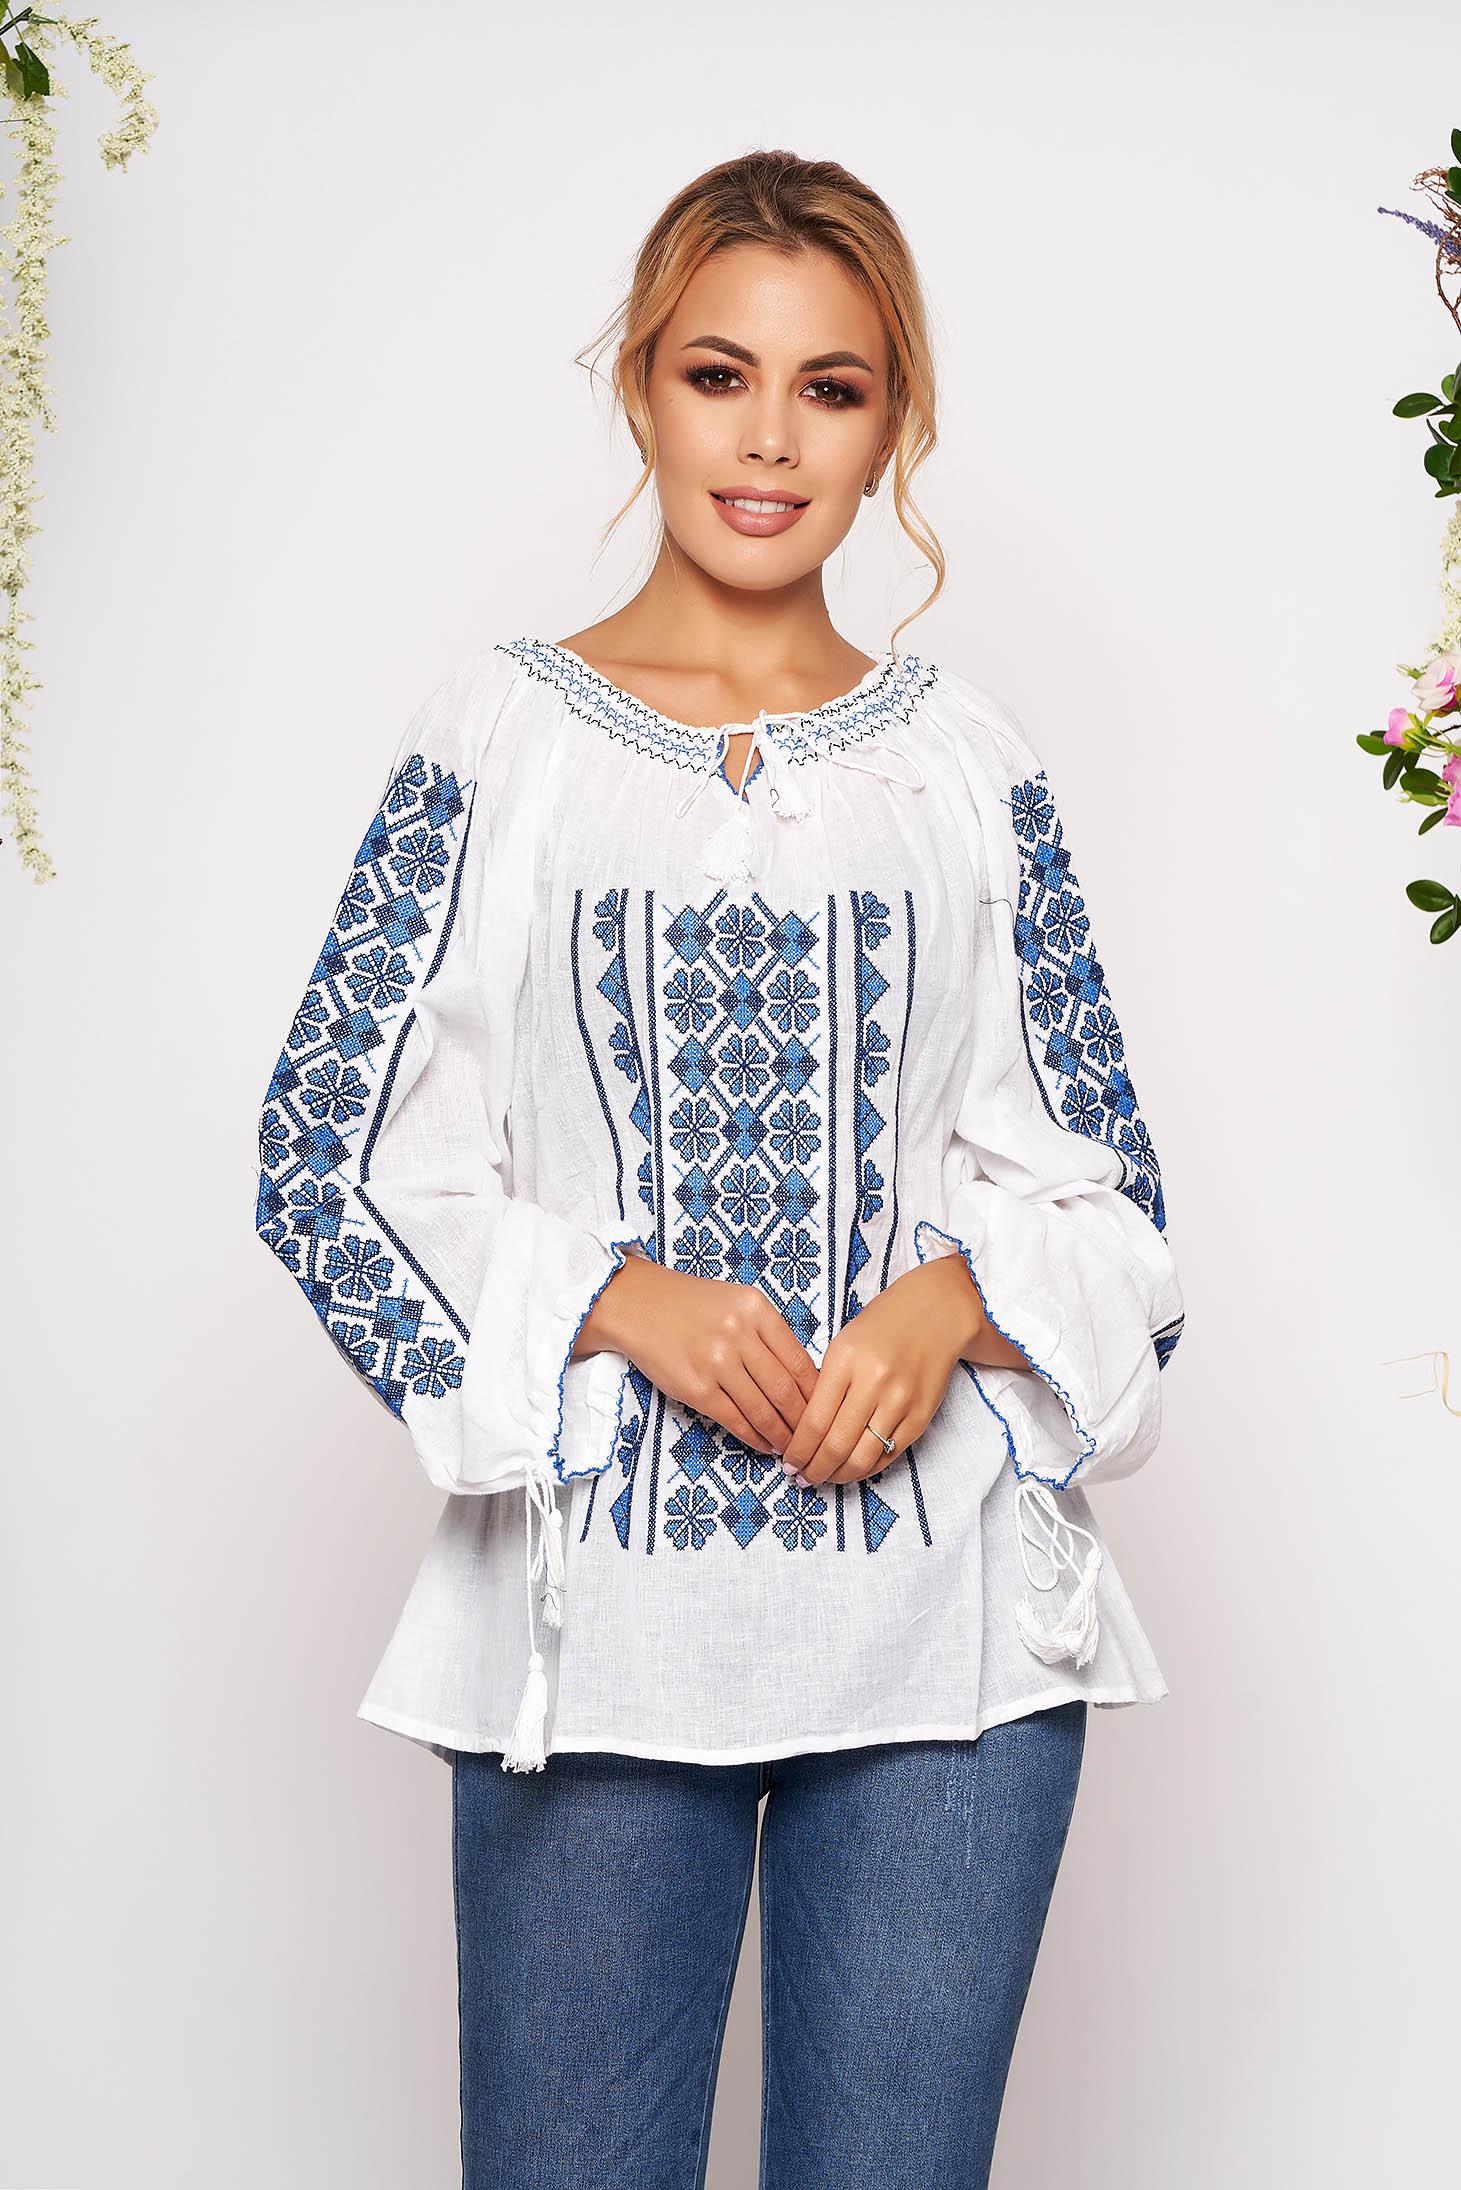 Bluza dama albastra brodata cu croi larg din bumbac neelastic accesorizata cu snur